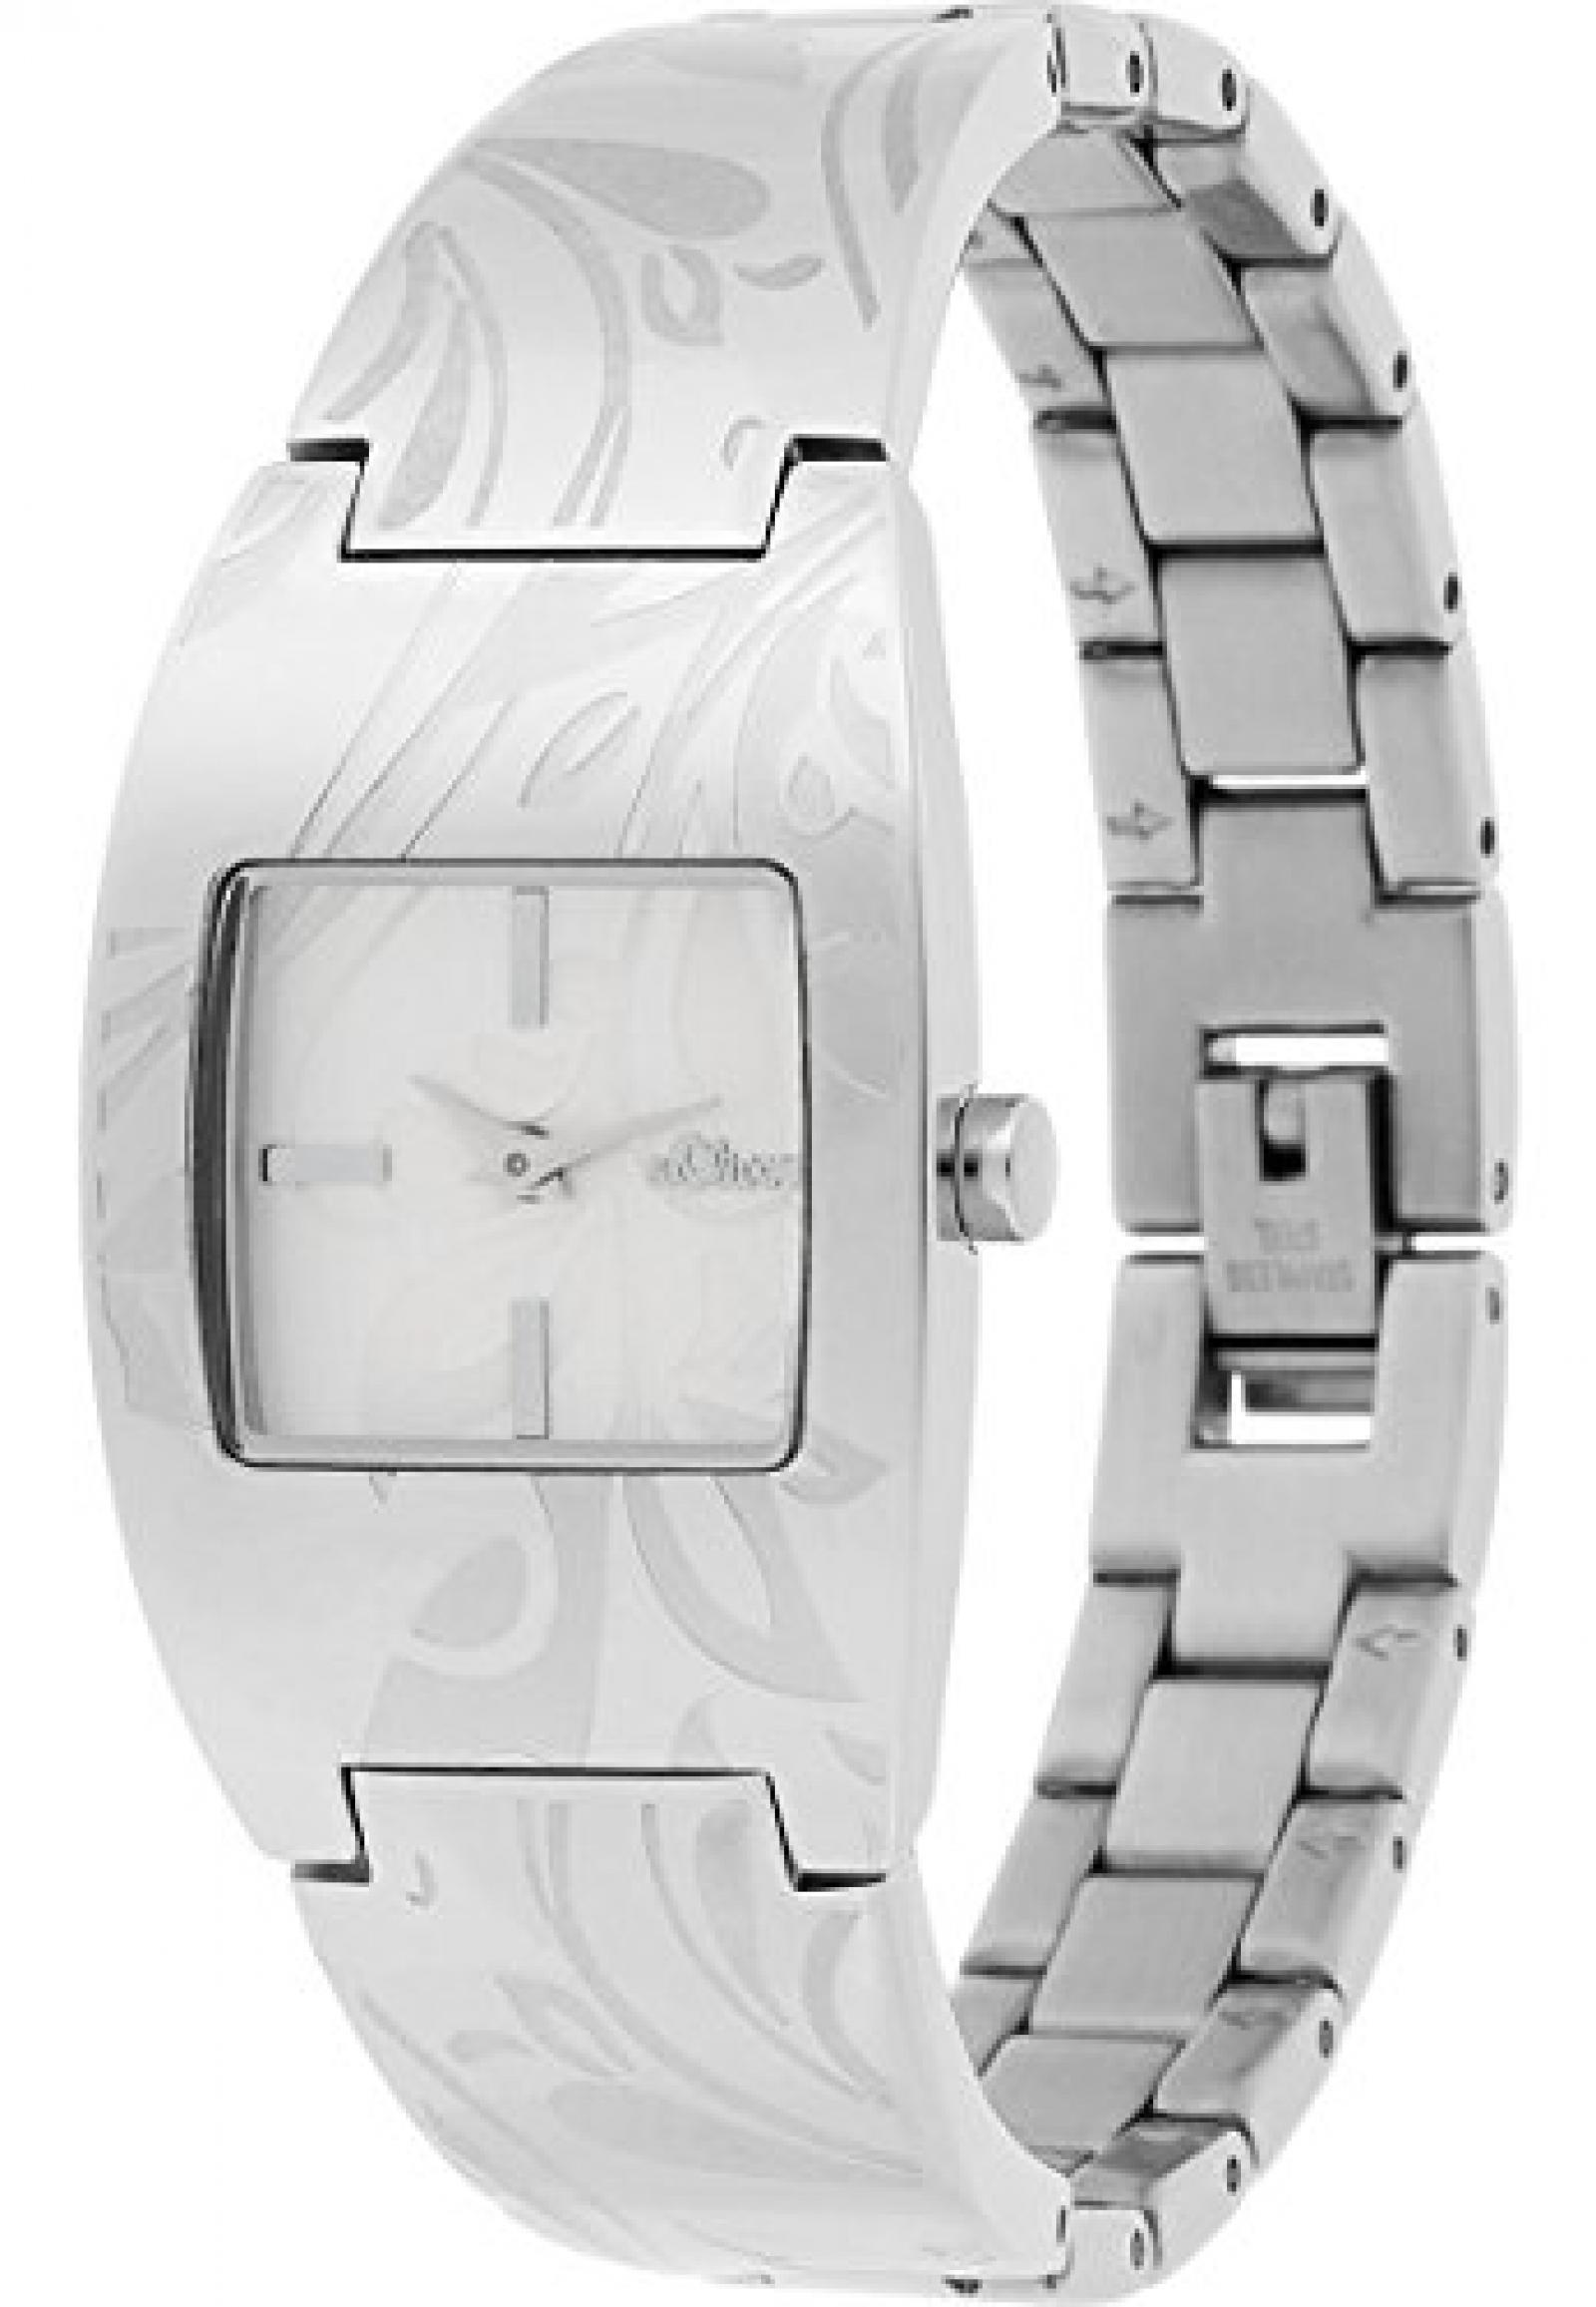 S.Oliver Damen-Armbanduhr Analog Quarz (One Size, silber)